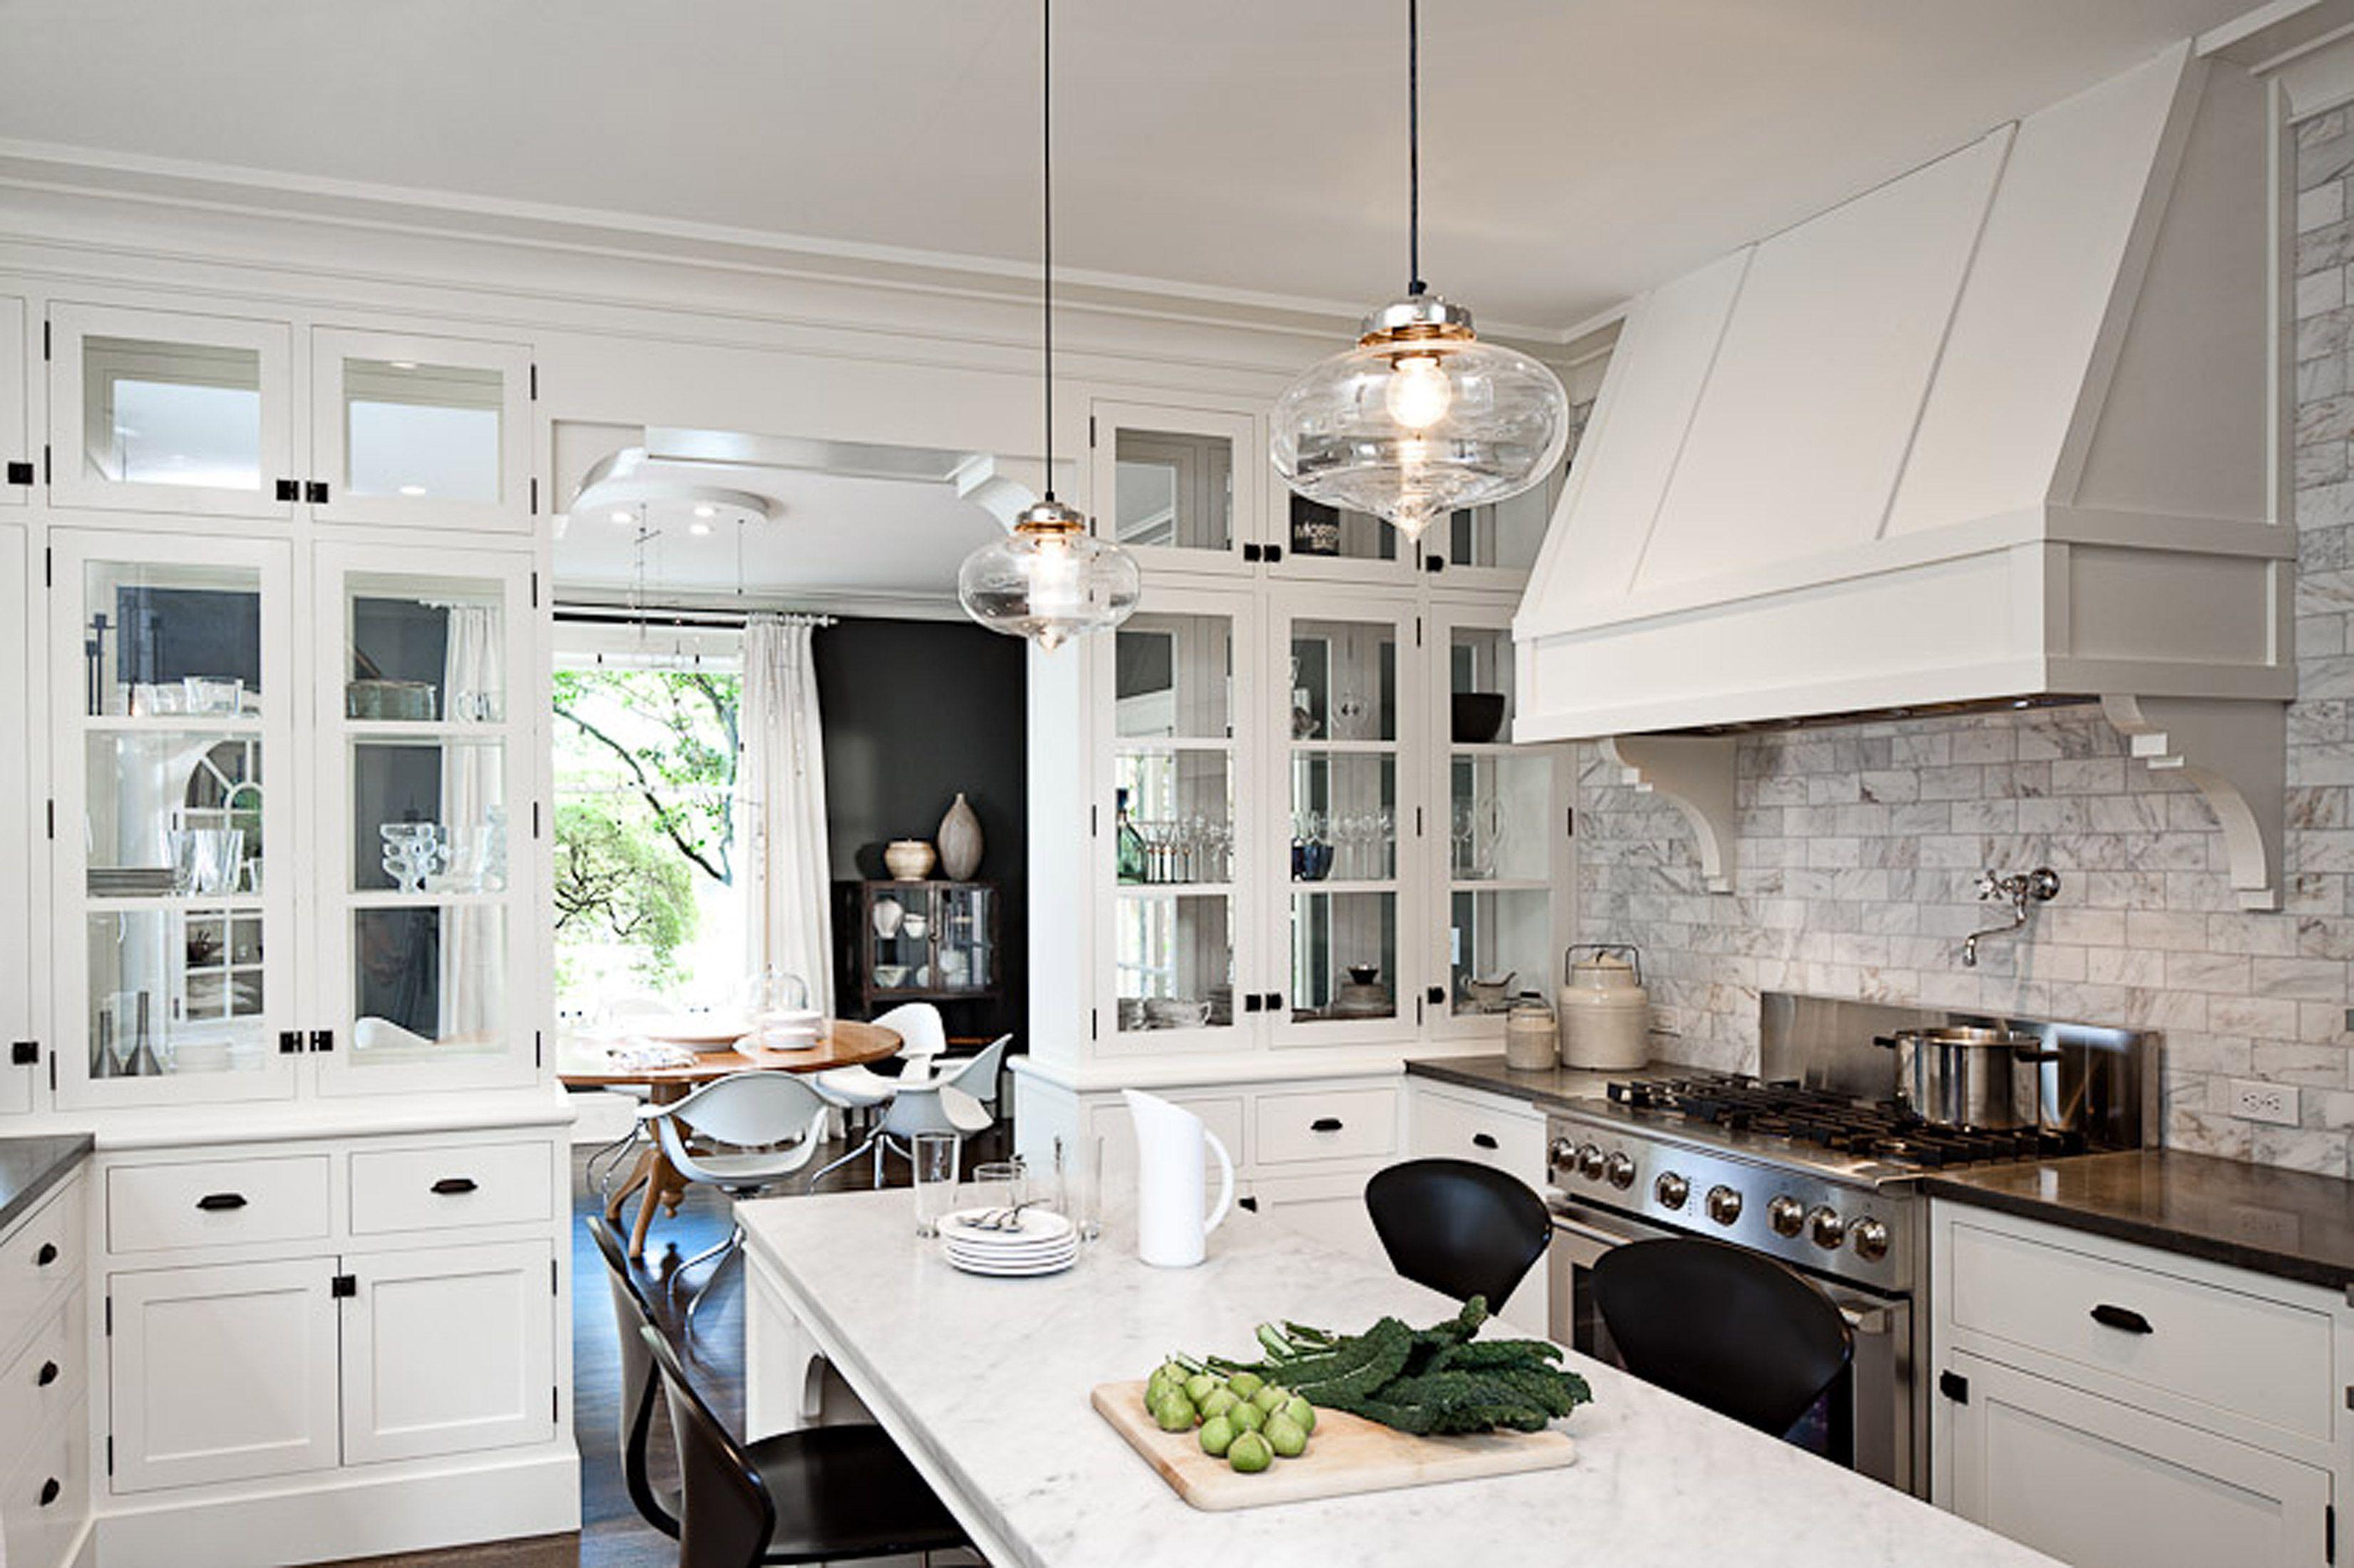 Install Pendant Lights Over Kitchen Island | kitchen lighting ...